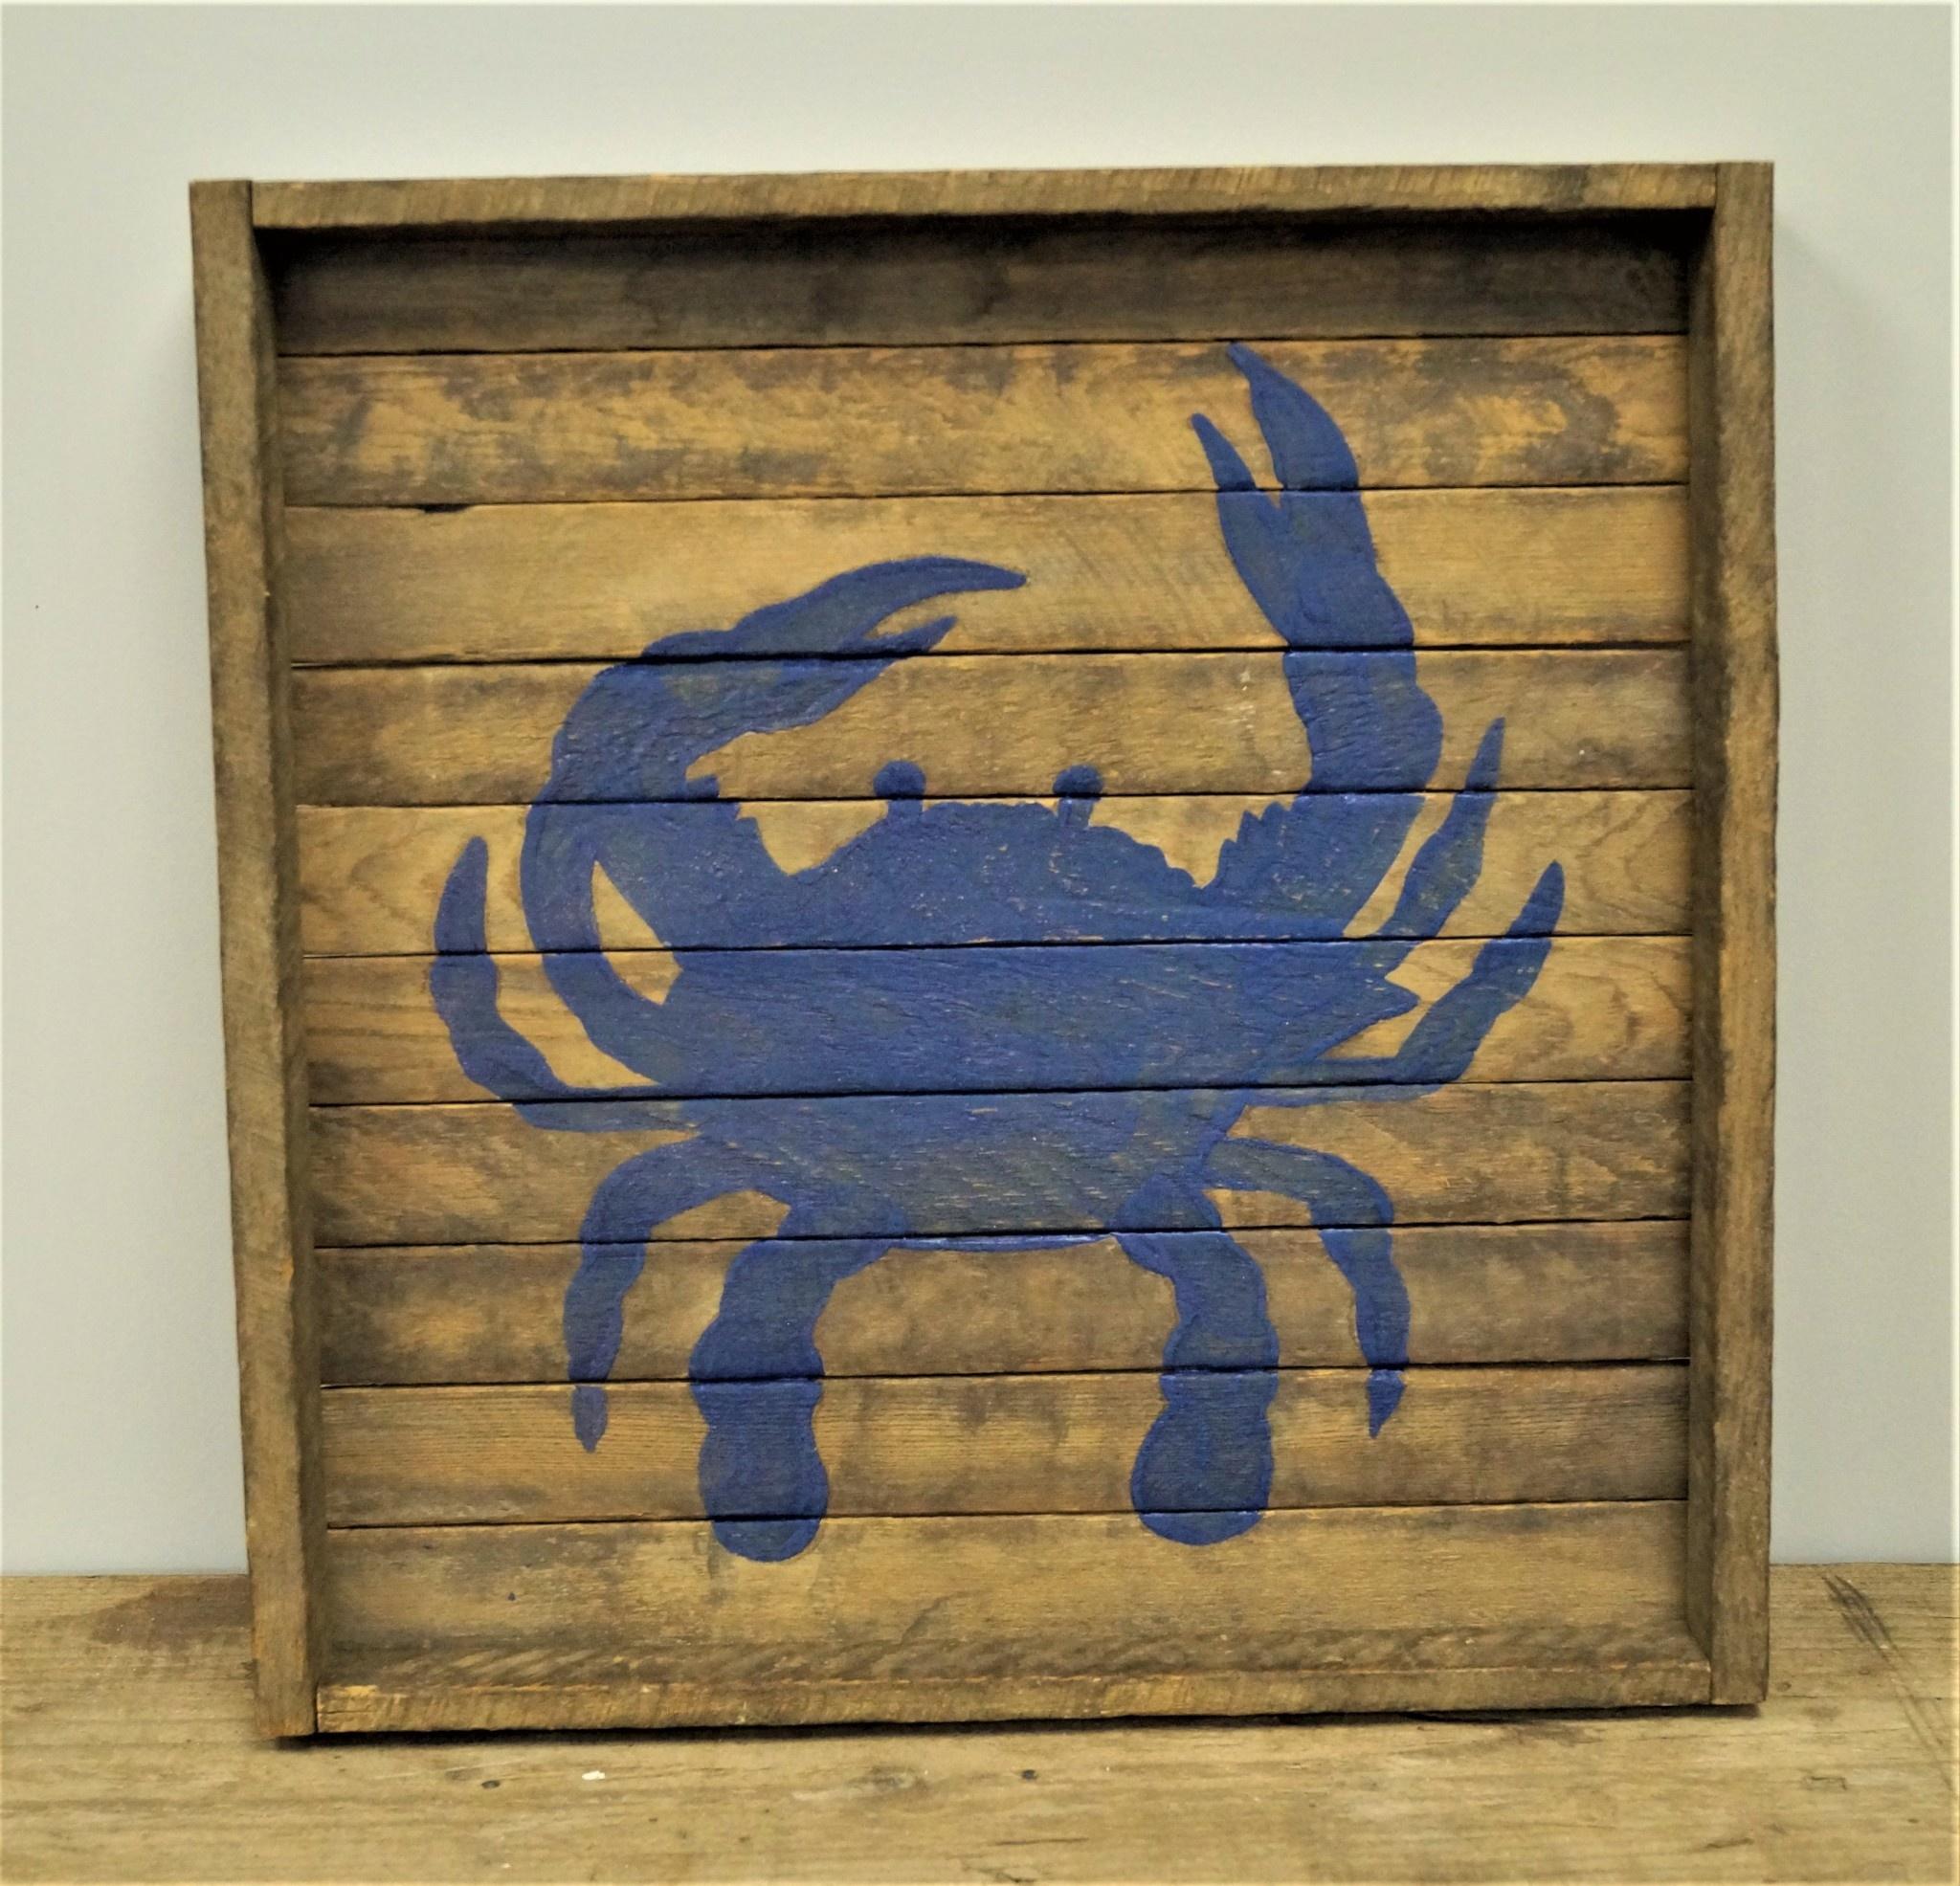 16x16 Tobacco Tray Square Crab Batik